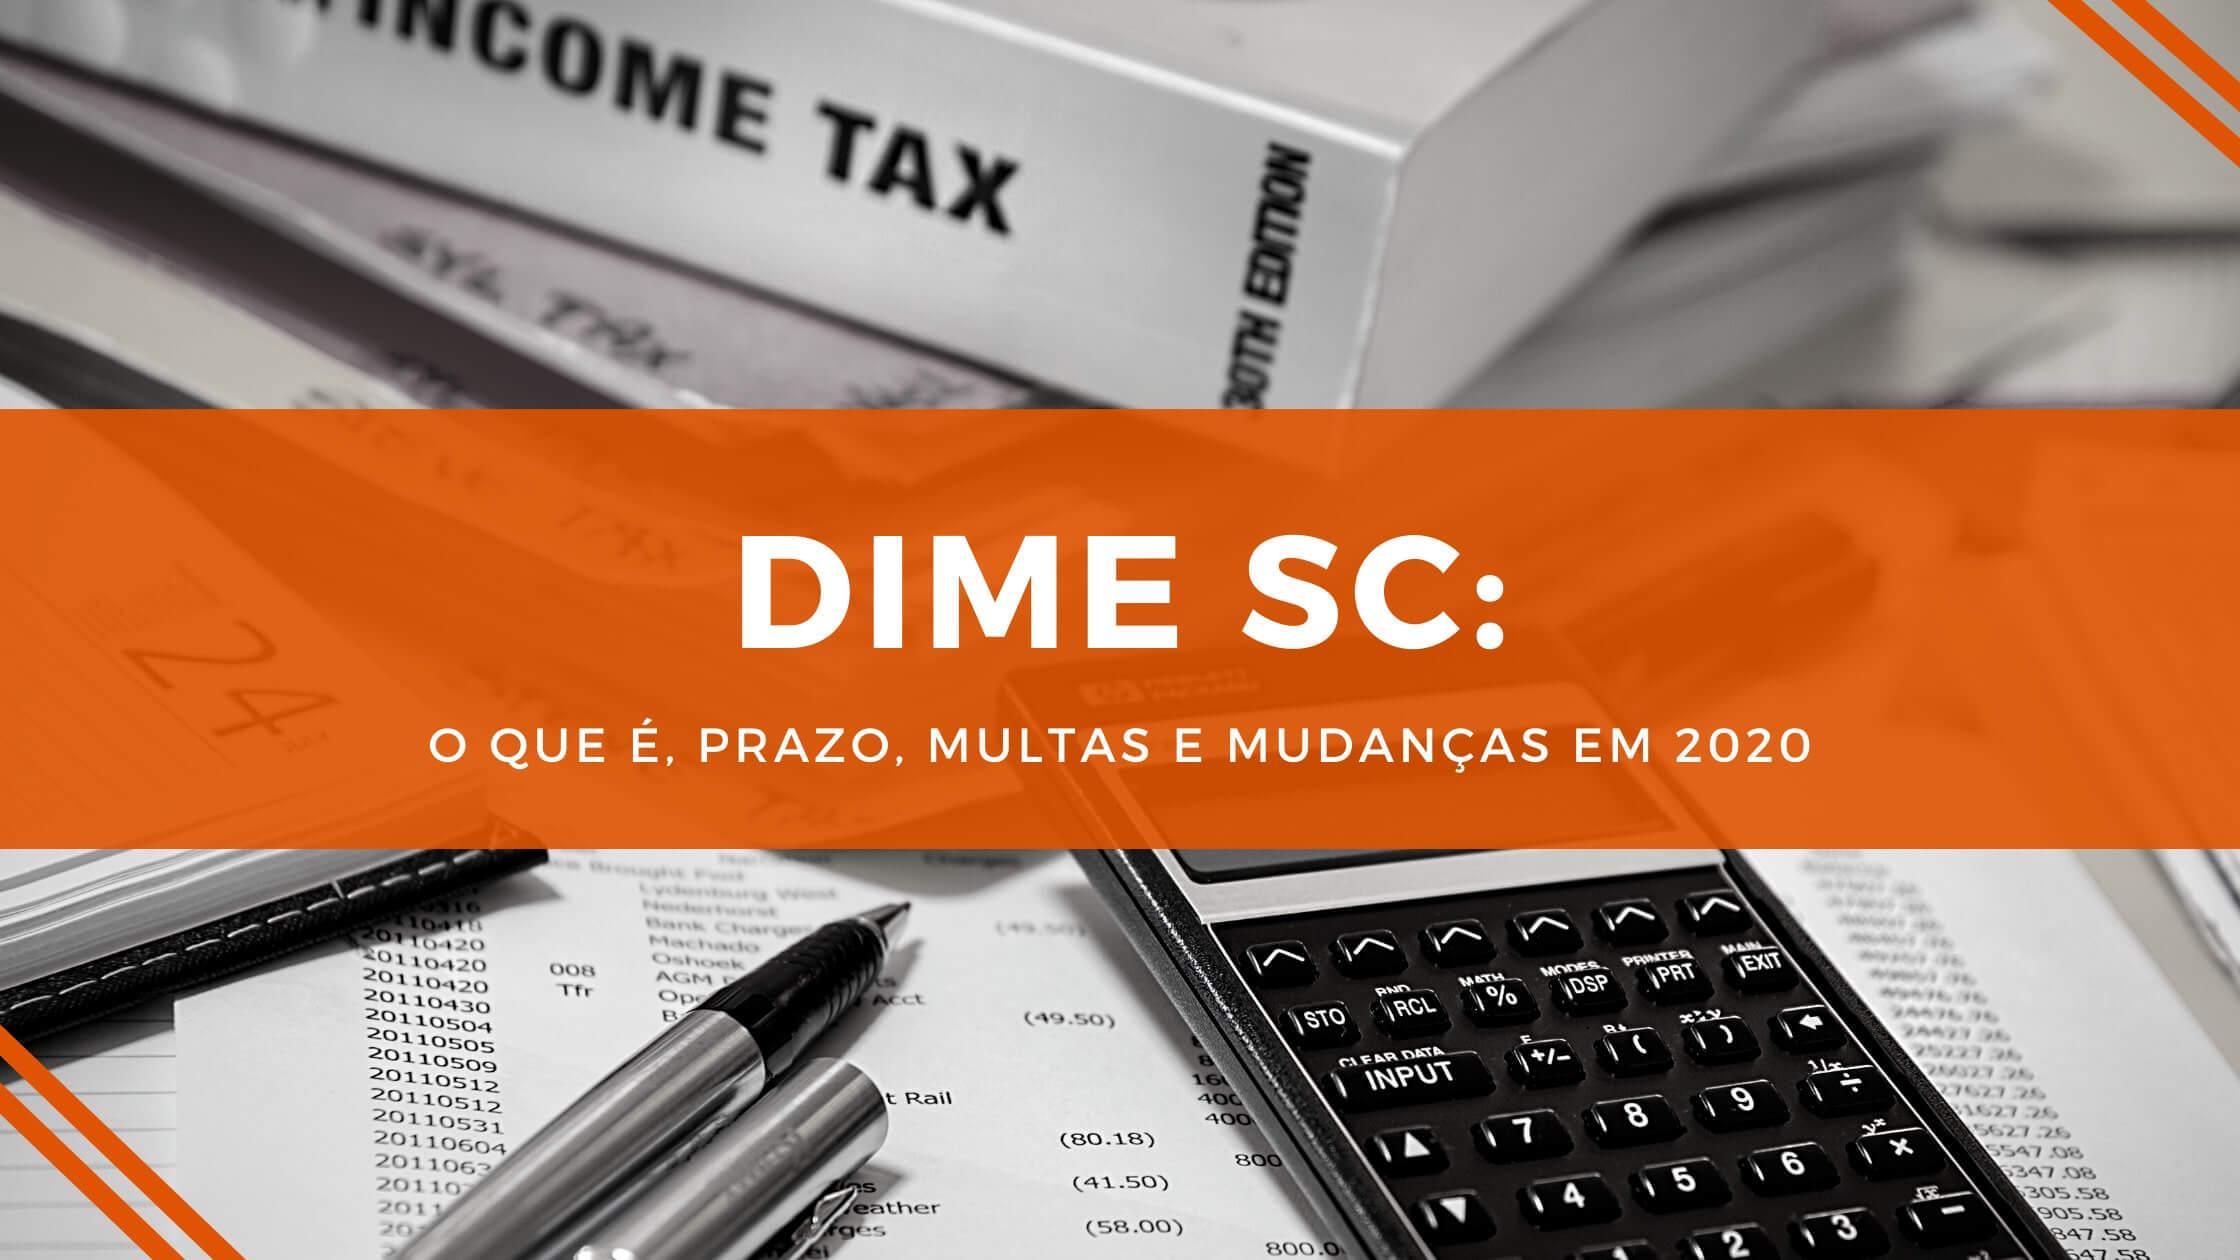 dime-sc